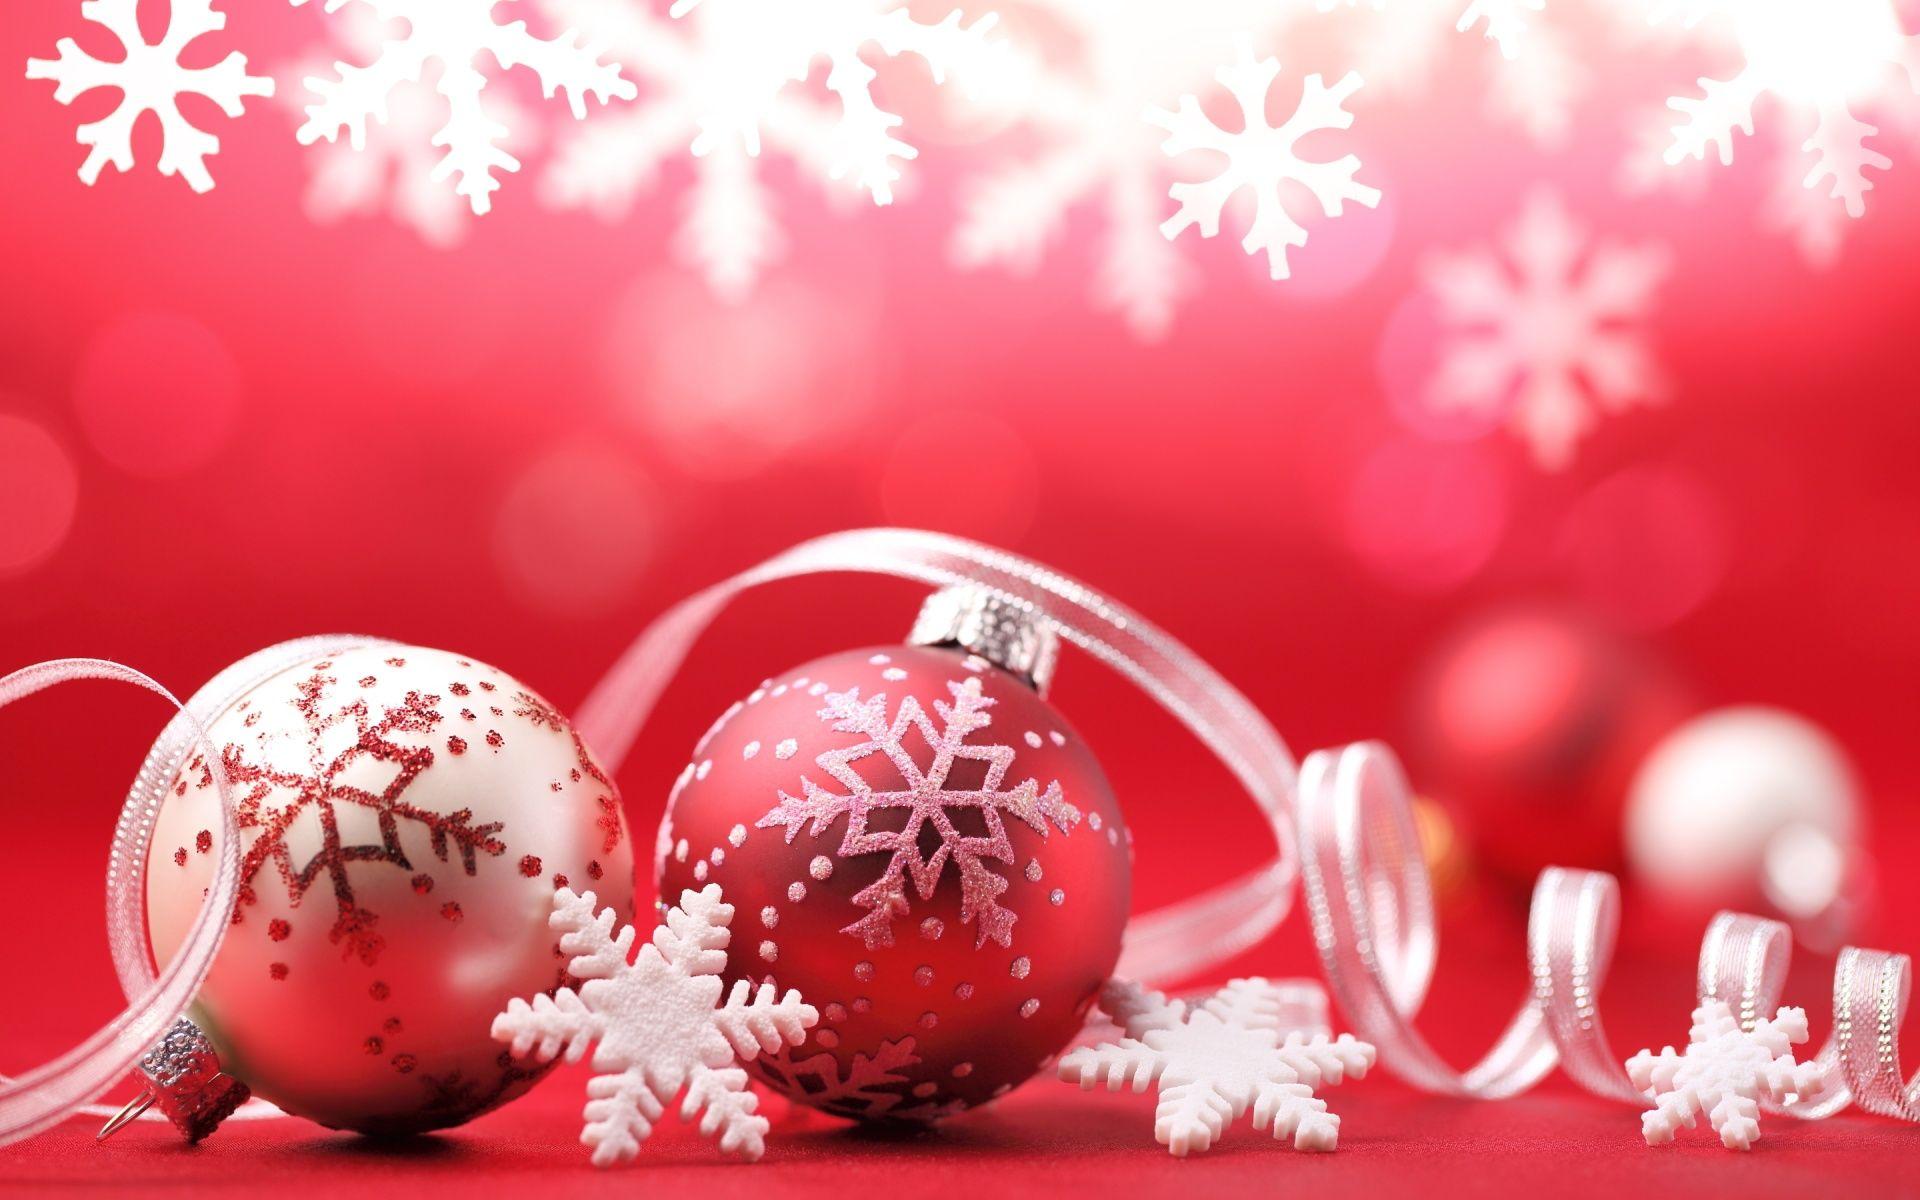 Christmas Ornament 1426113